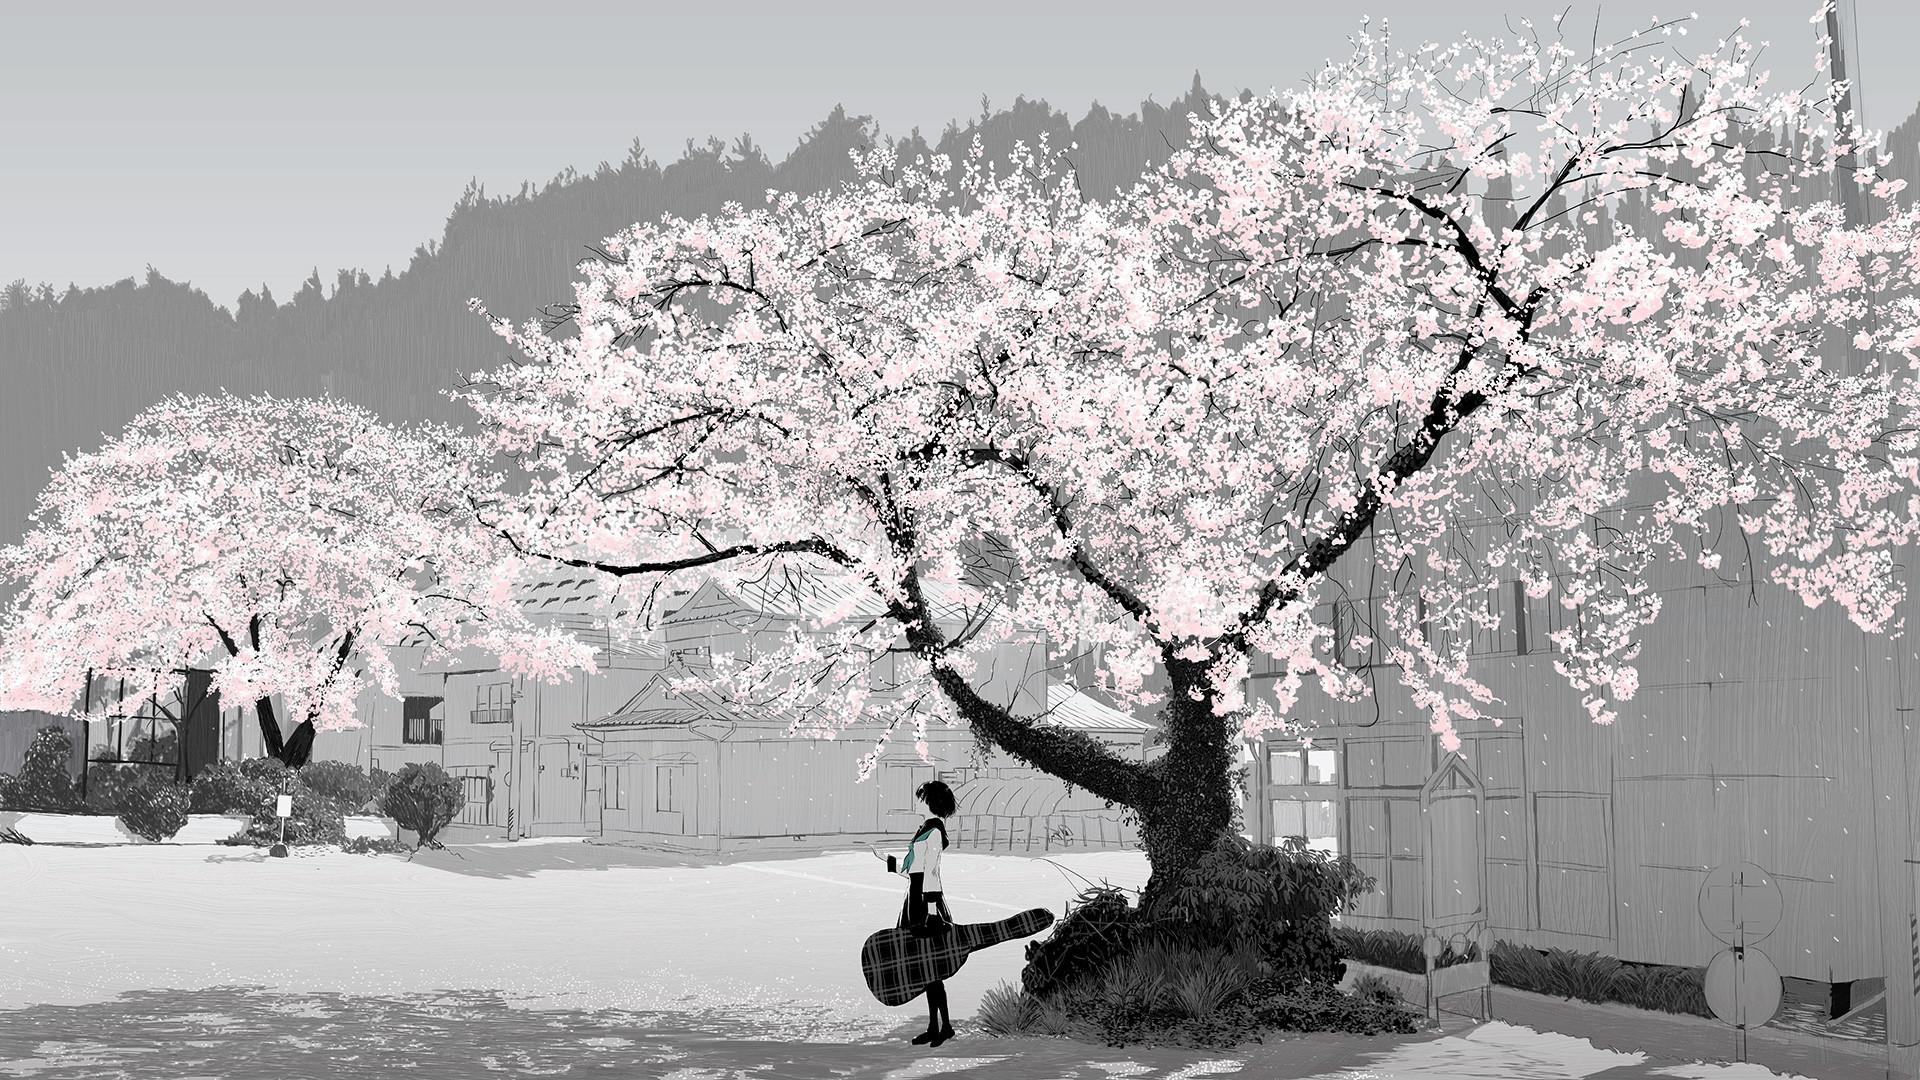 Anime – Original Original (Anime) Tree Sakura Blossom Guitar School Uniform  Skirt Short Hair